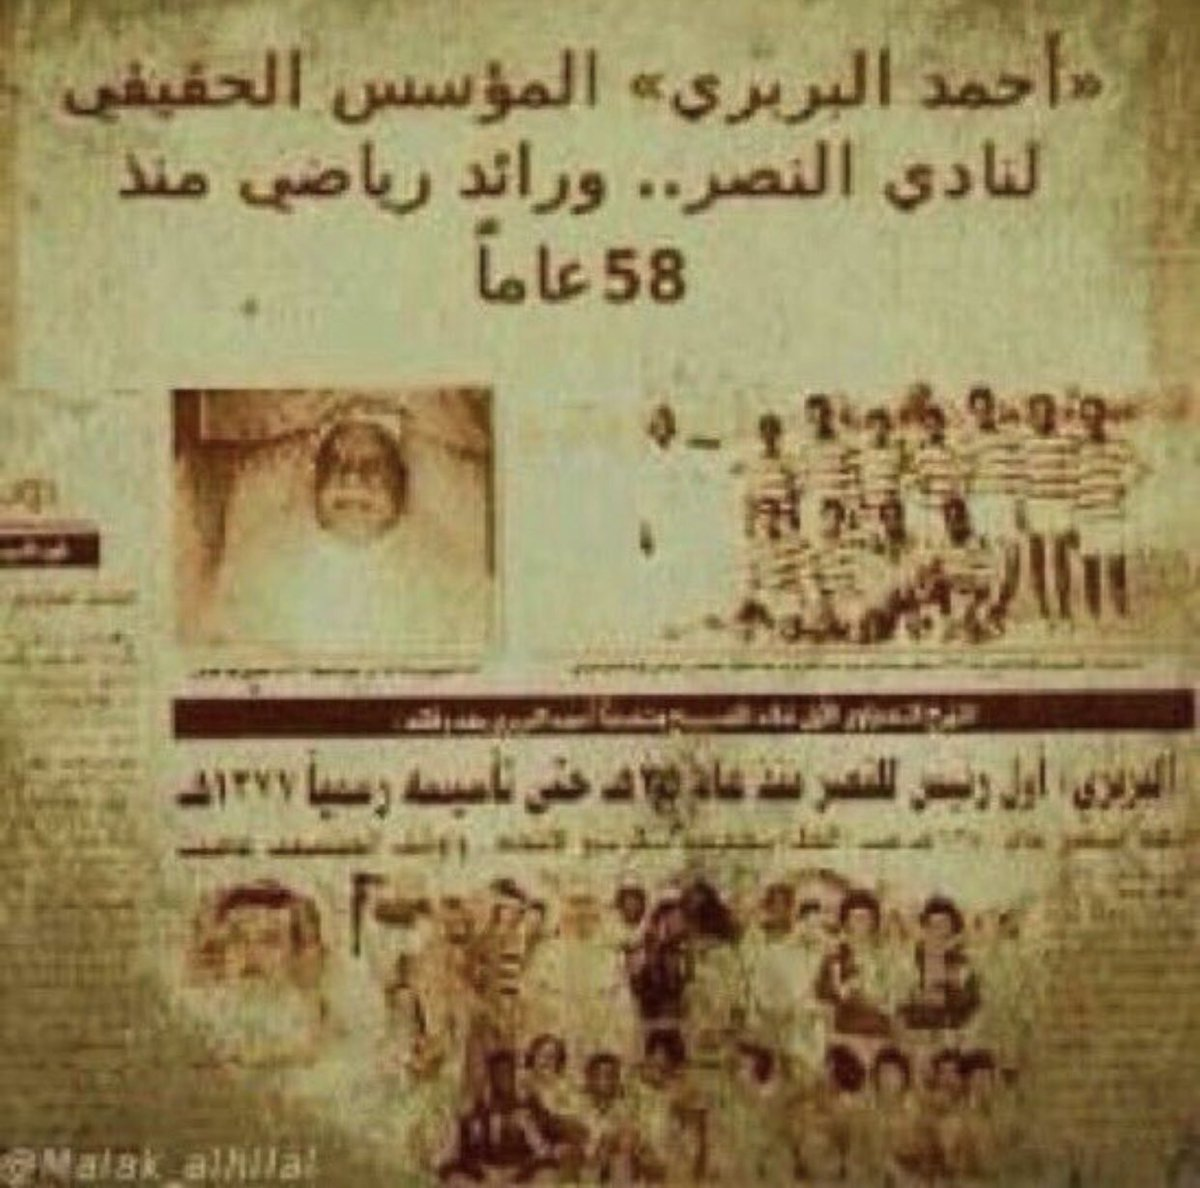 Oxyjen1957 A Twitter حقيقه نادي النصر أسسه شخص من الجاليات العربية المقيمة في السعودية واختار شعاره من علم السودان النصر نادي الجاليات Https T Co I3cnufy2dd